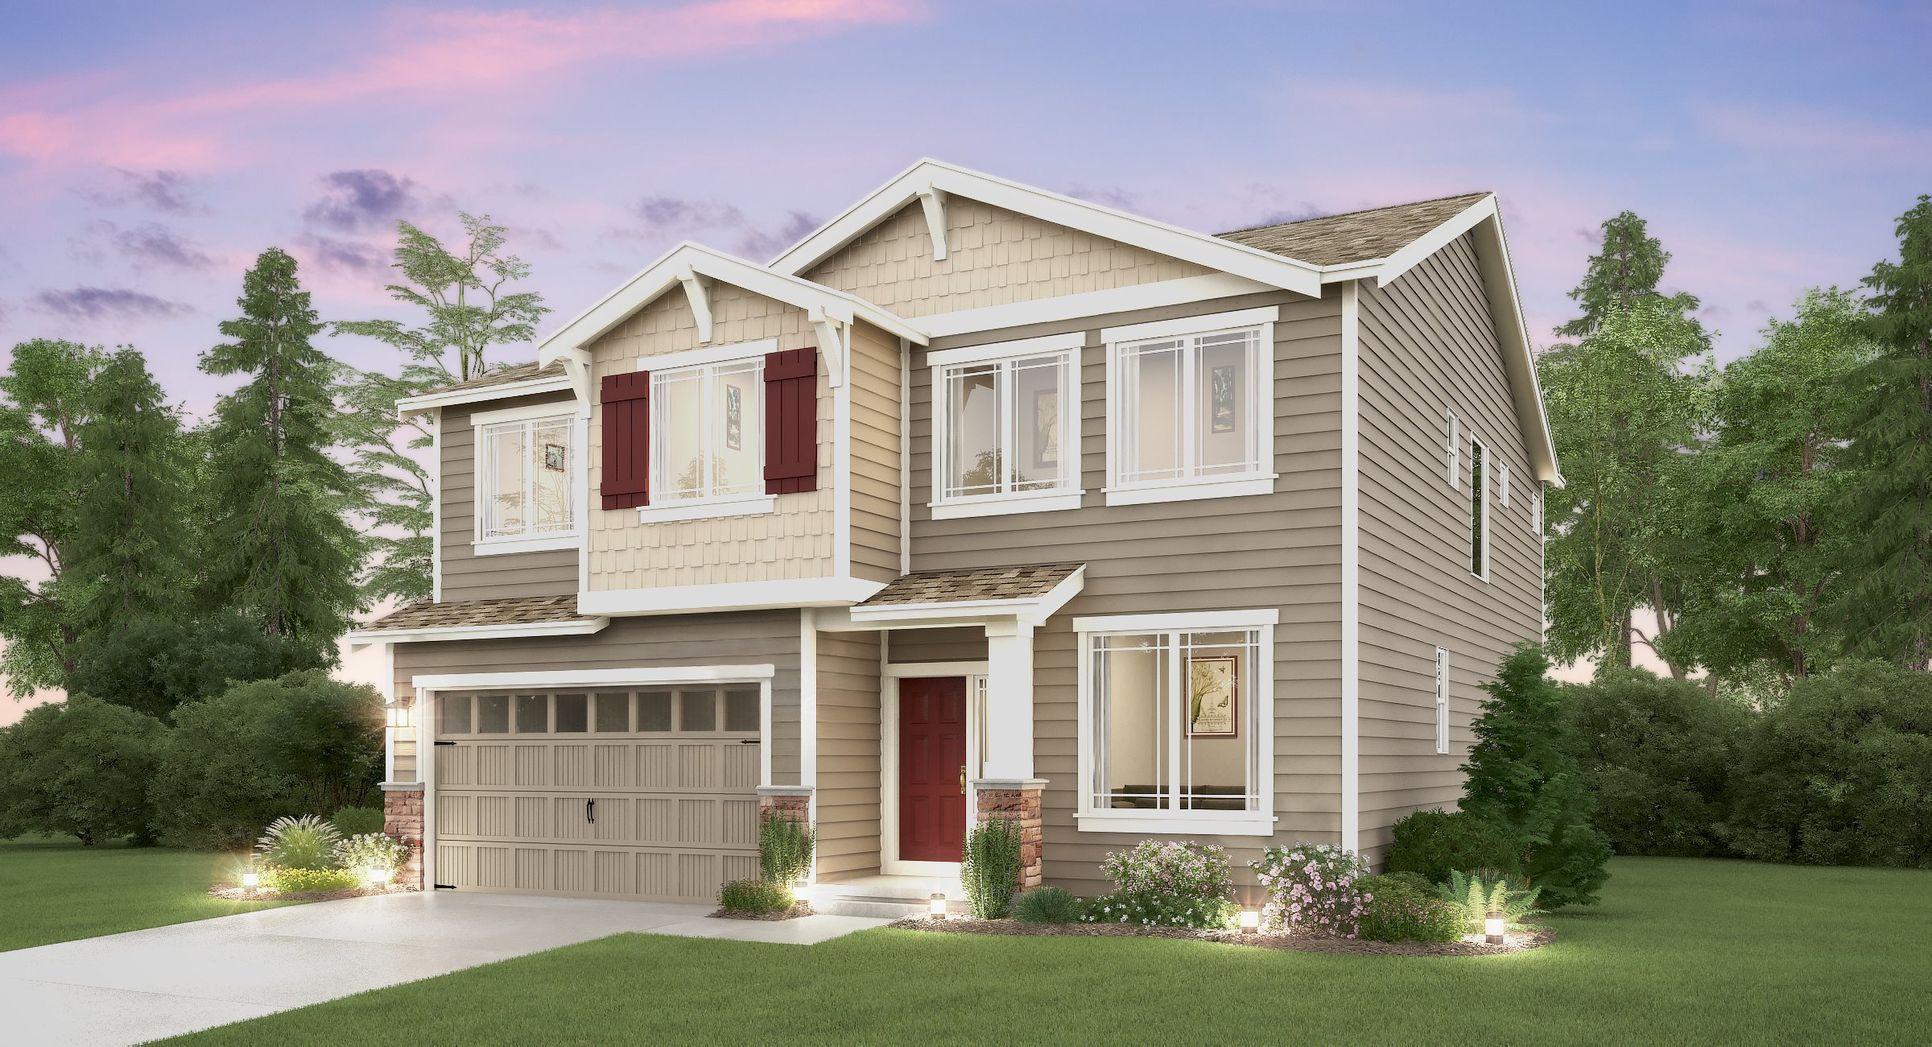 The Davenport home, Elevation B